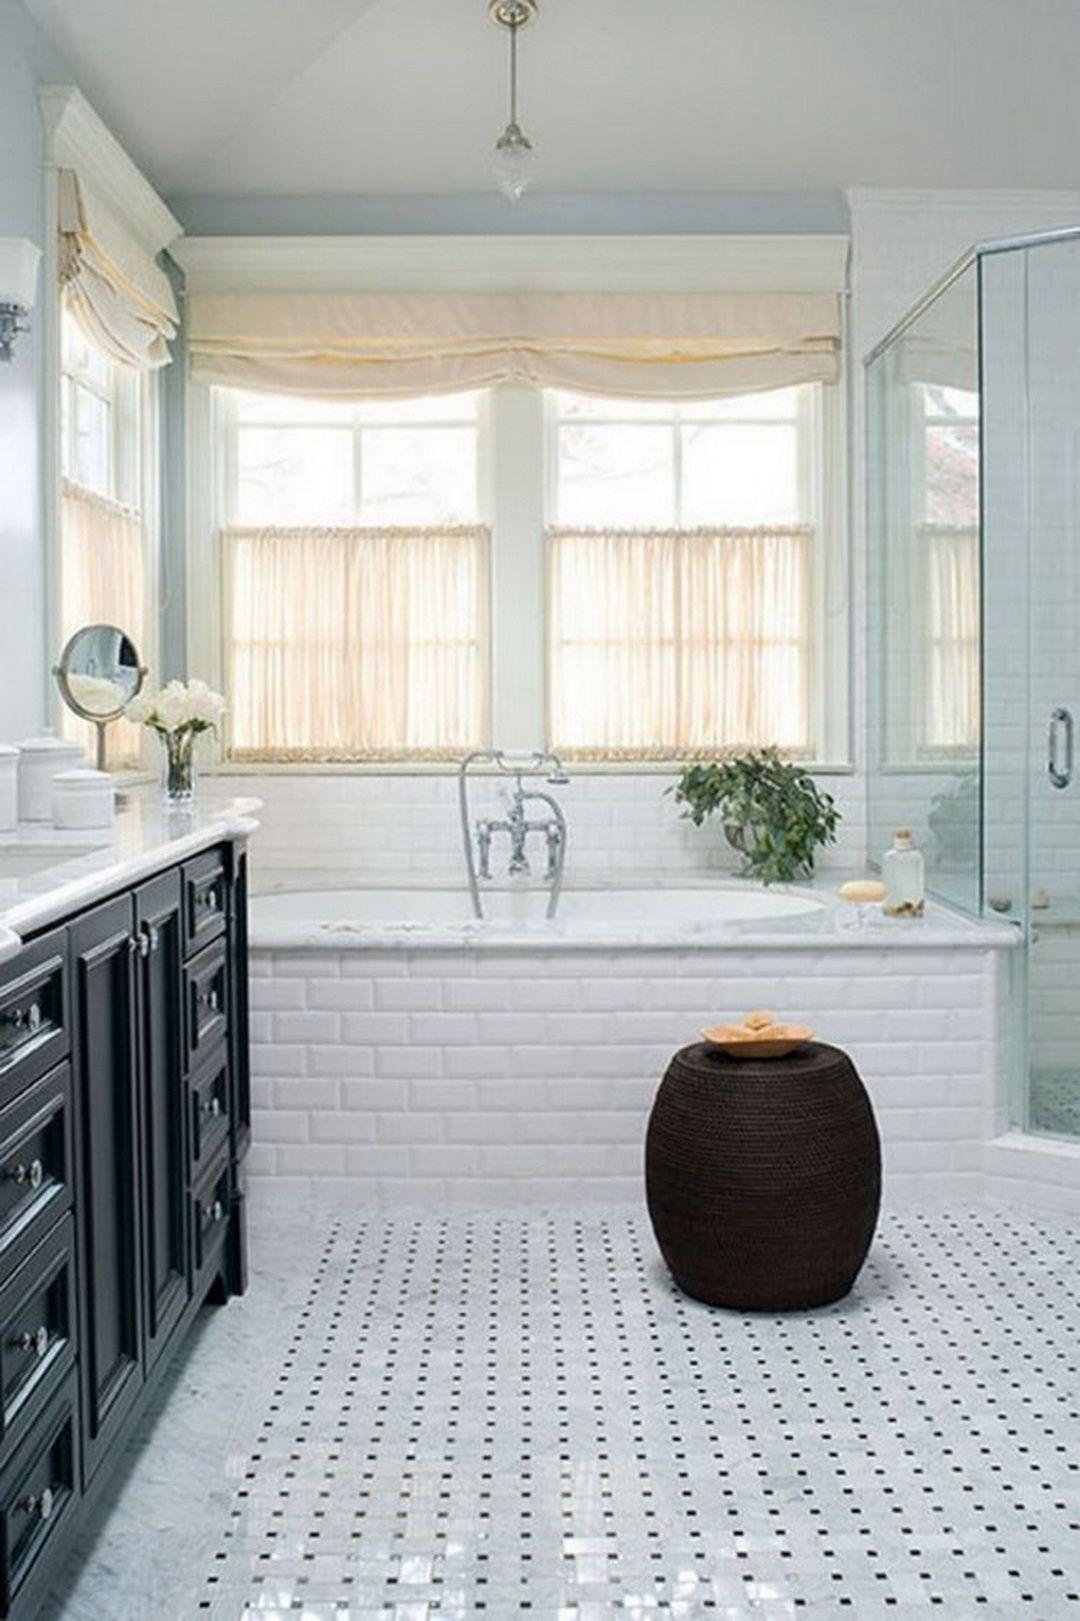 26 Trending Luxury Master-Bathroom Designs 🛀 | Master bathrooms ...